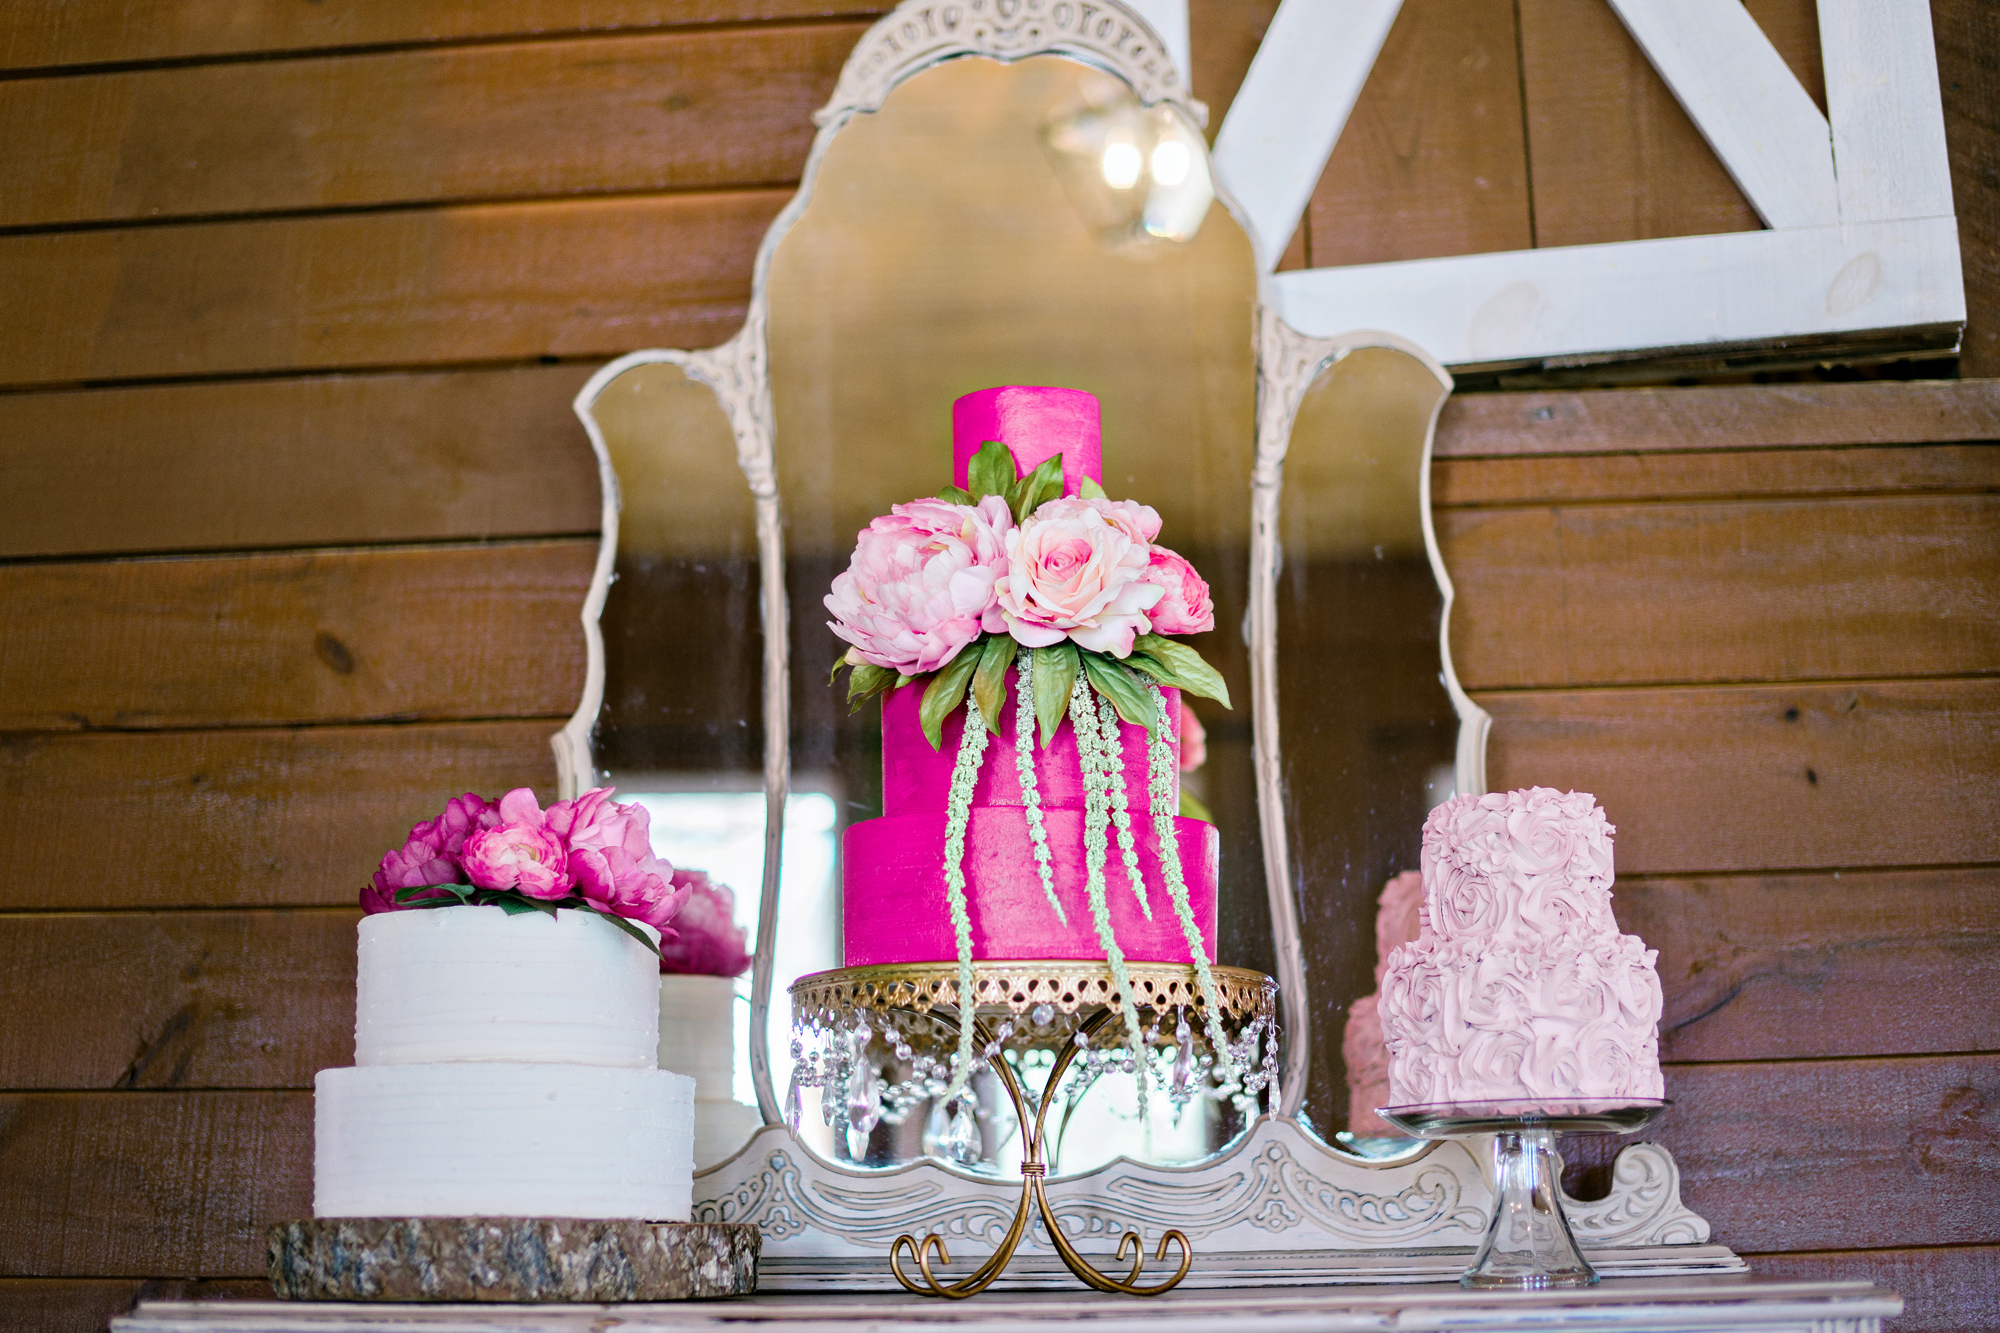 Opulent Treasures Cake Stands Andie Freeman Photo Pink Wedding Cake02.jpg